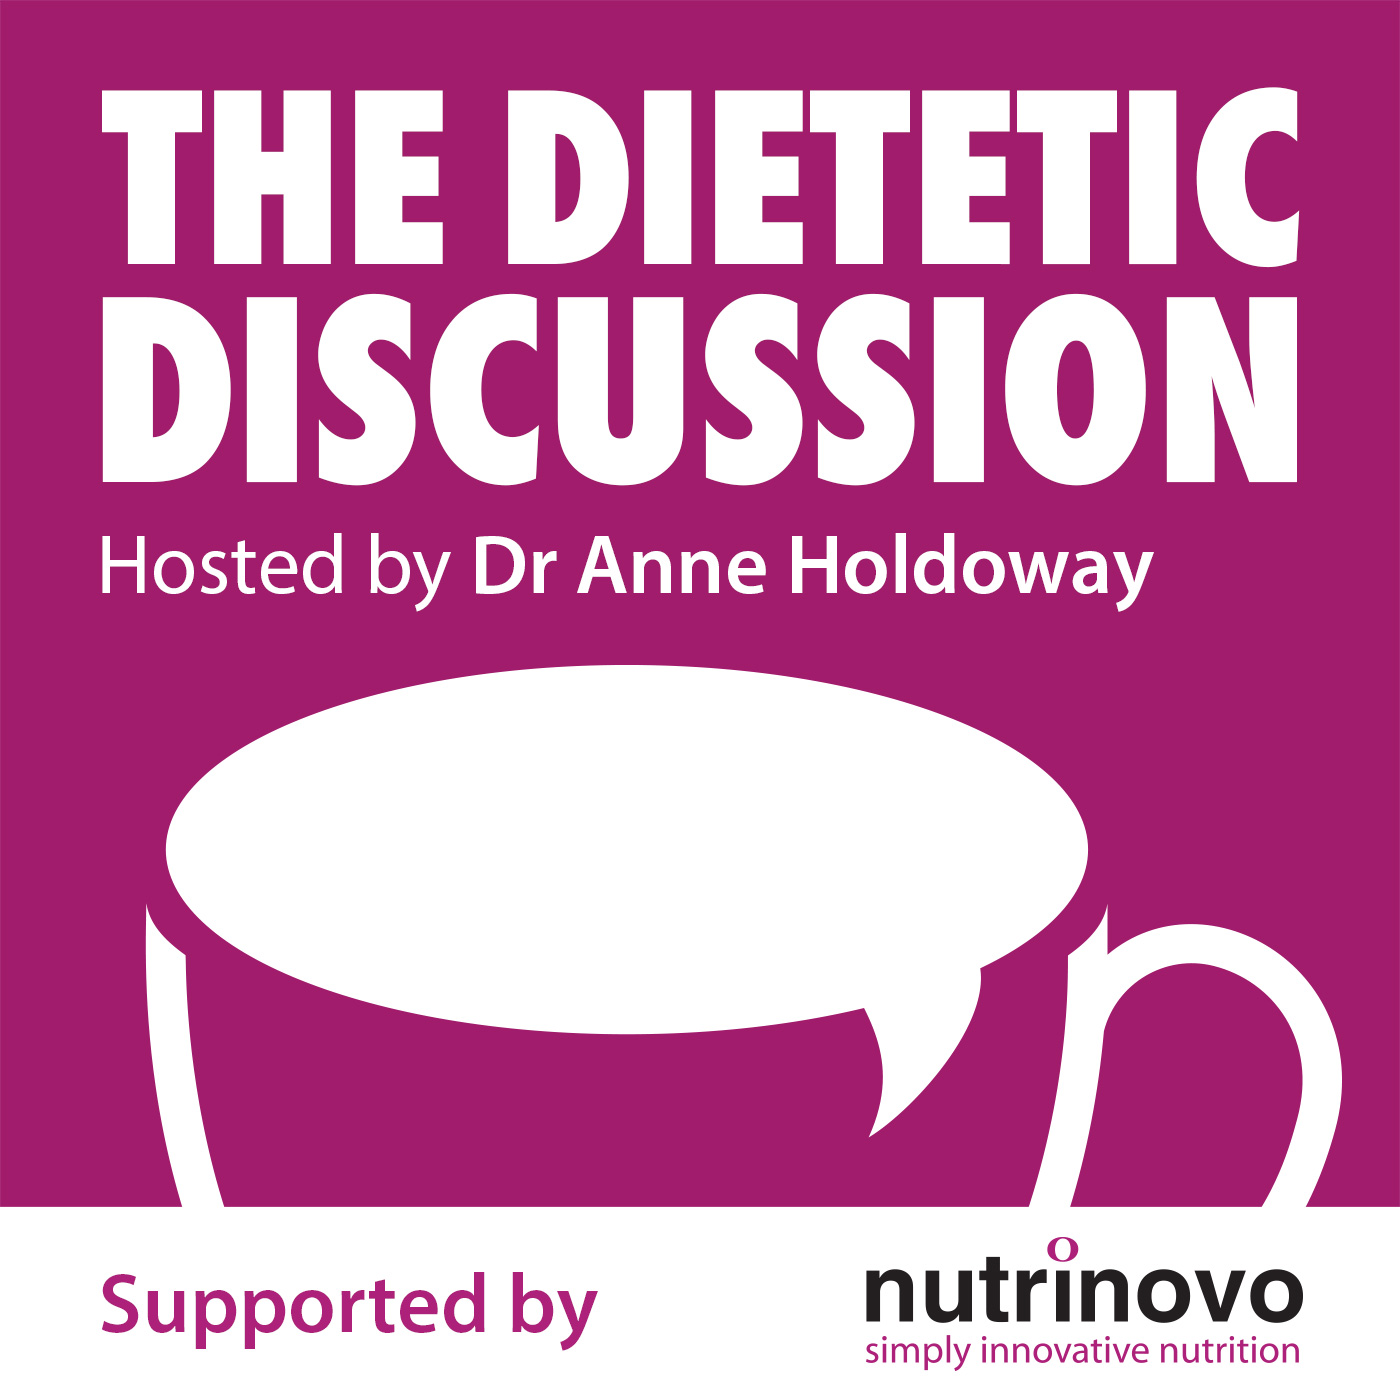 The Dietetic Discussion